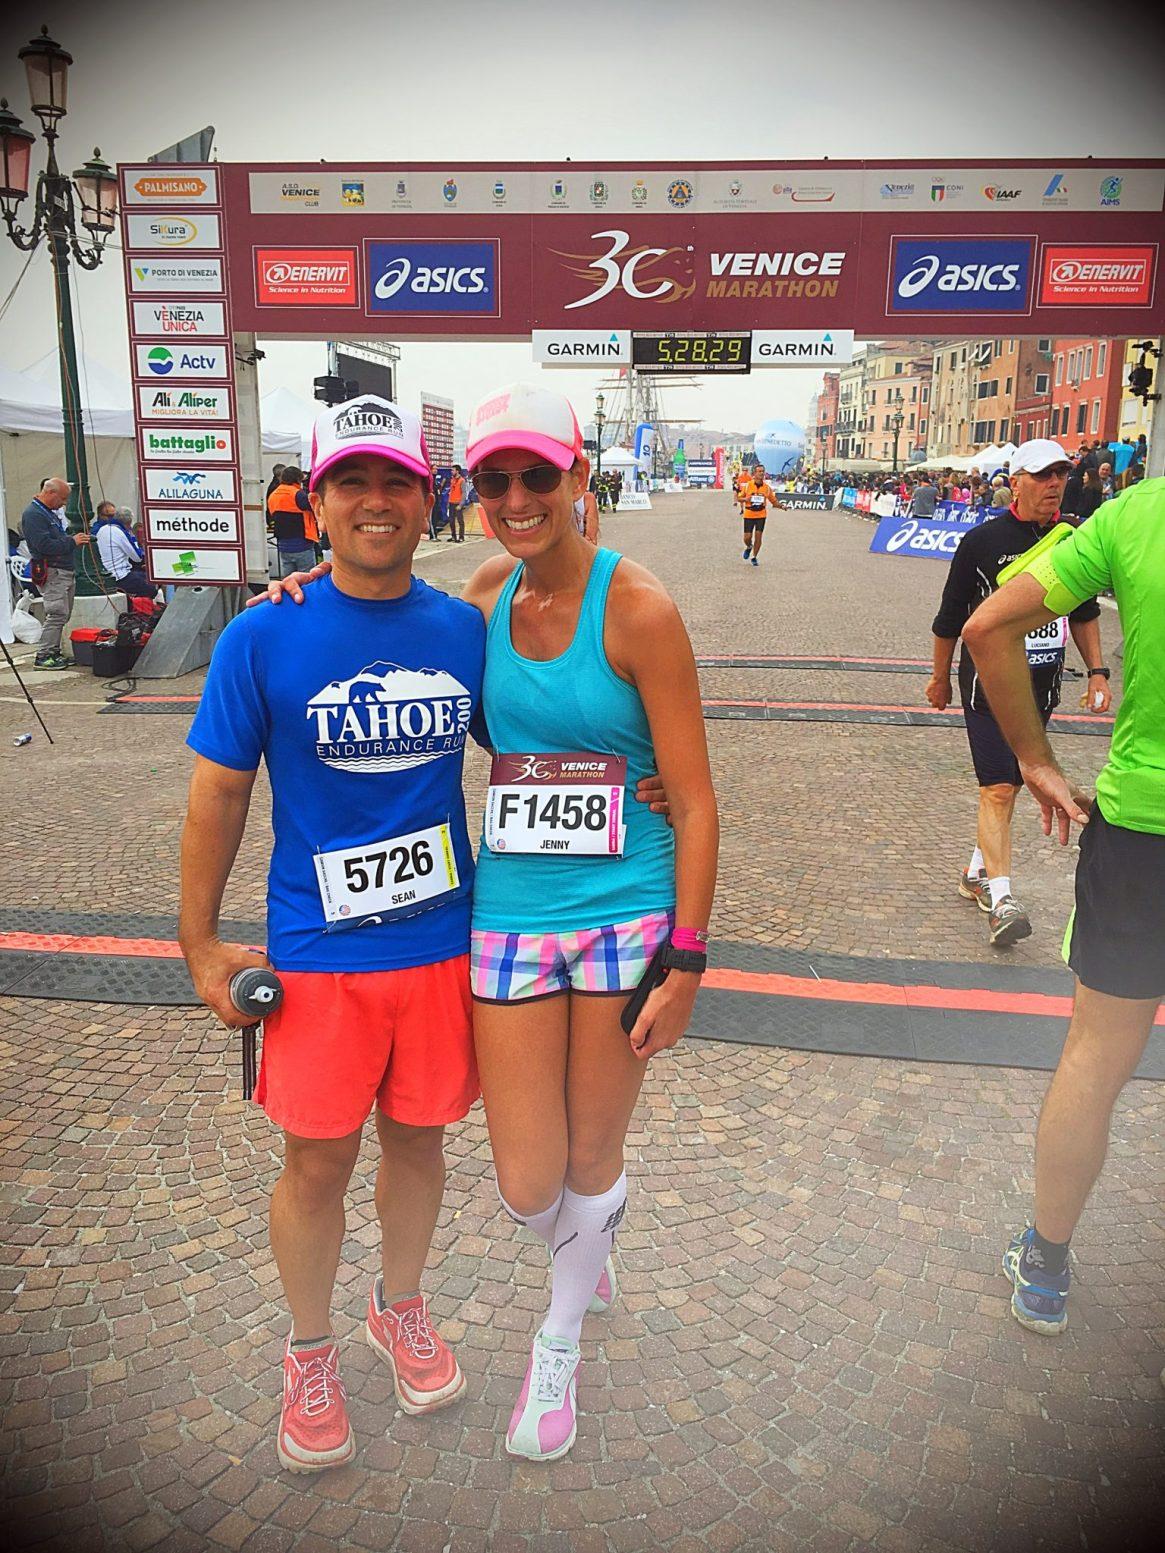 Venice Marathon, 30th Anniversary, Marathon, Venice, Italy, 2015, Finish Line, Photo, #teamnakamura